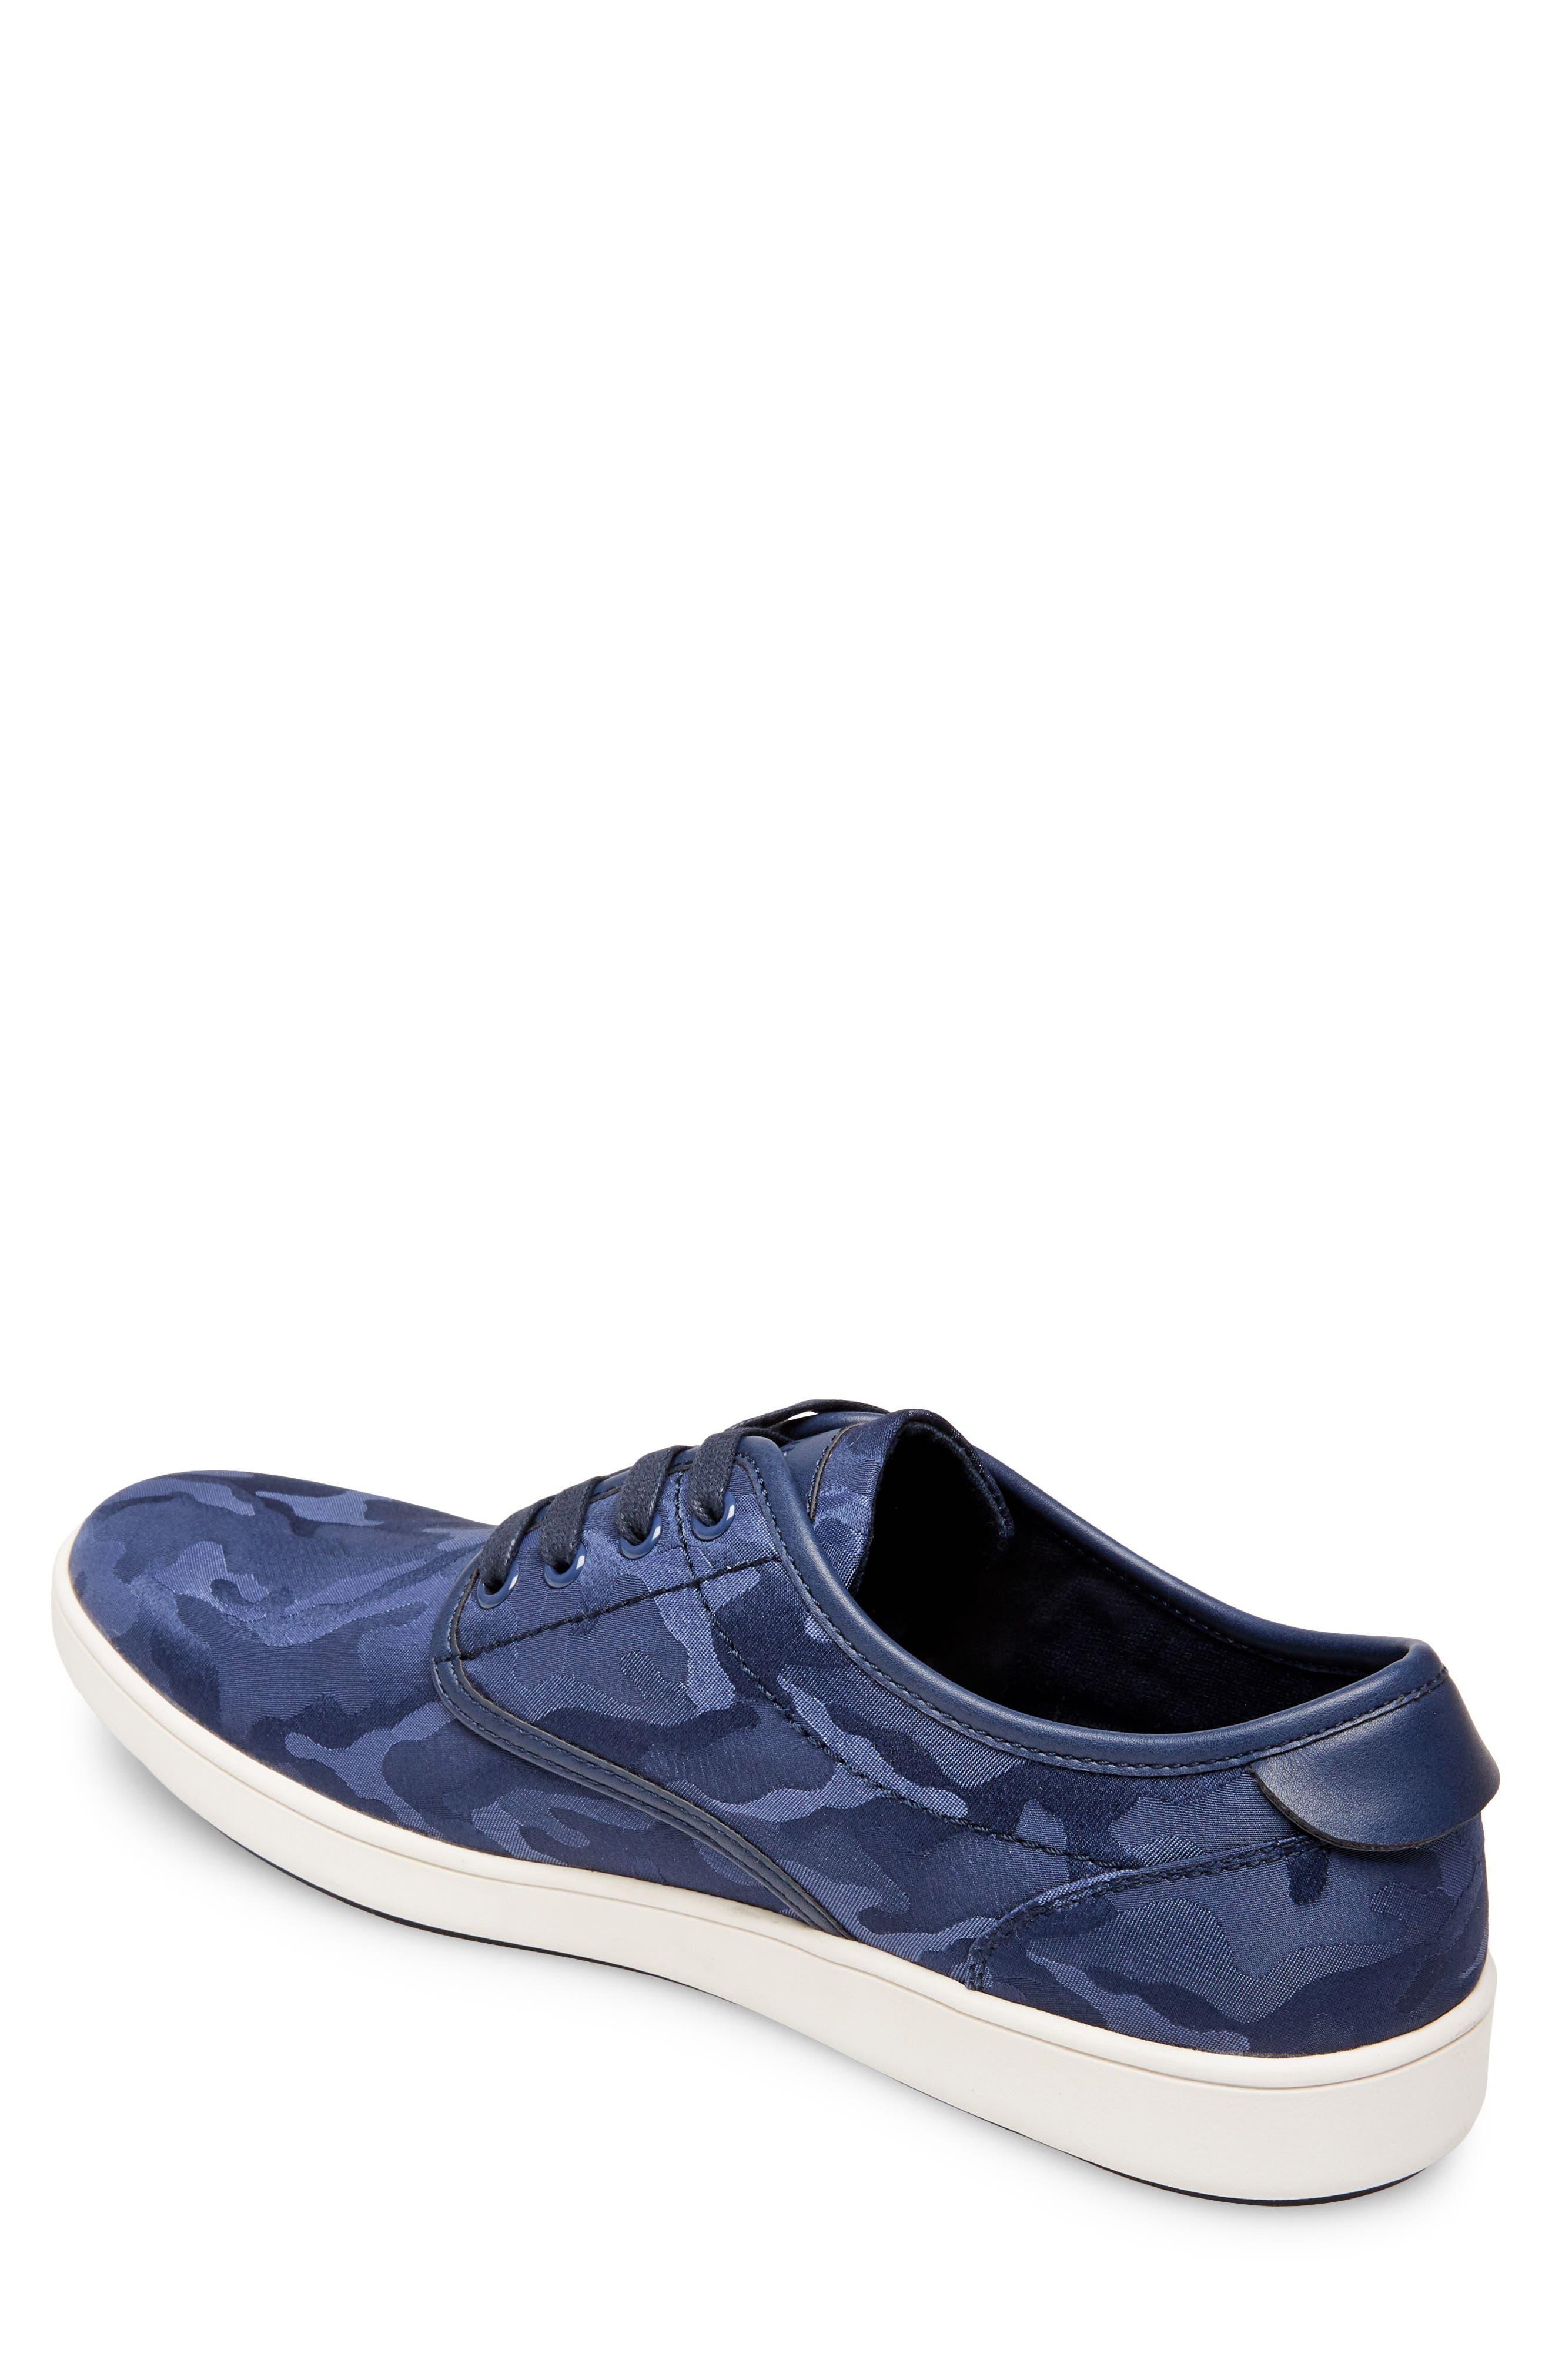 Frenzo Camo Sneaker,                             Alternate thumbnail 2, color,                             Blue Camo Fabric